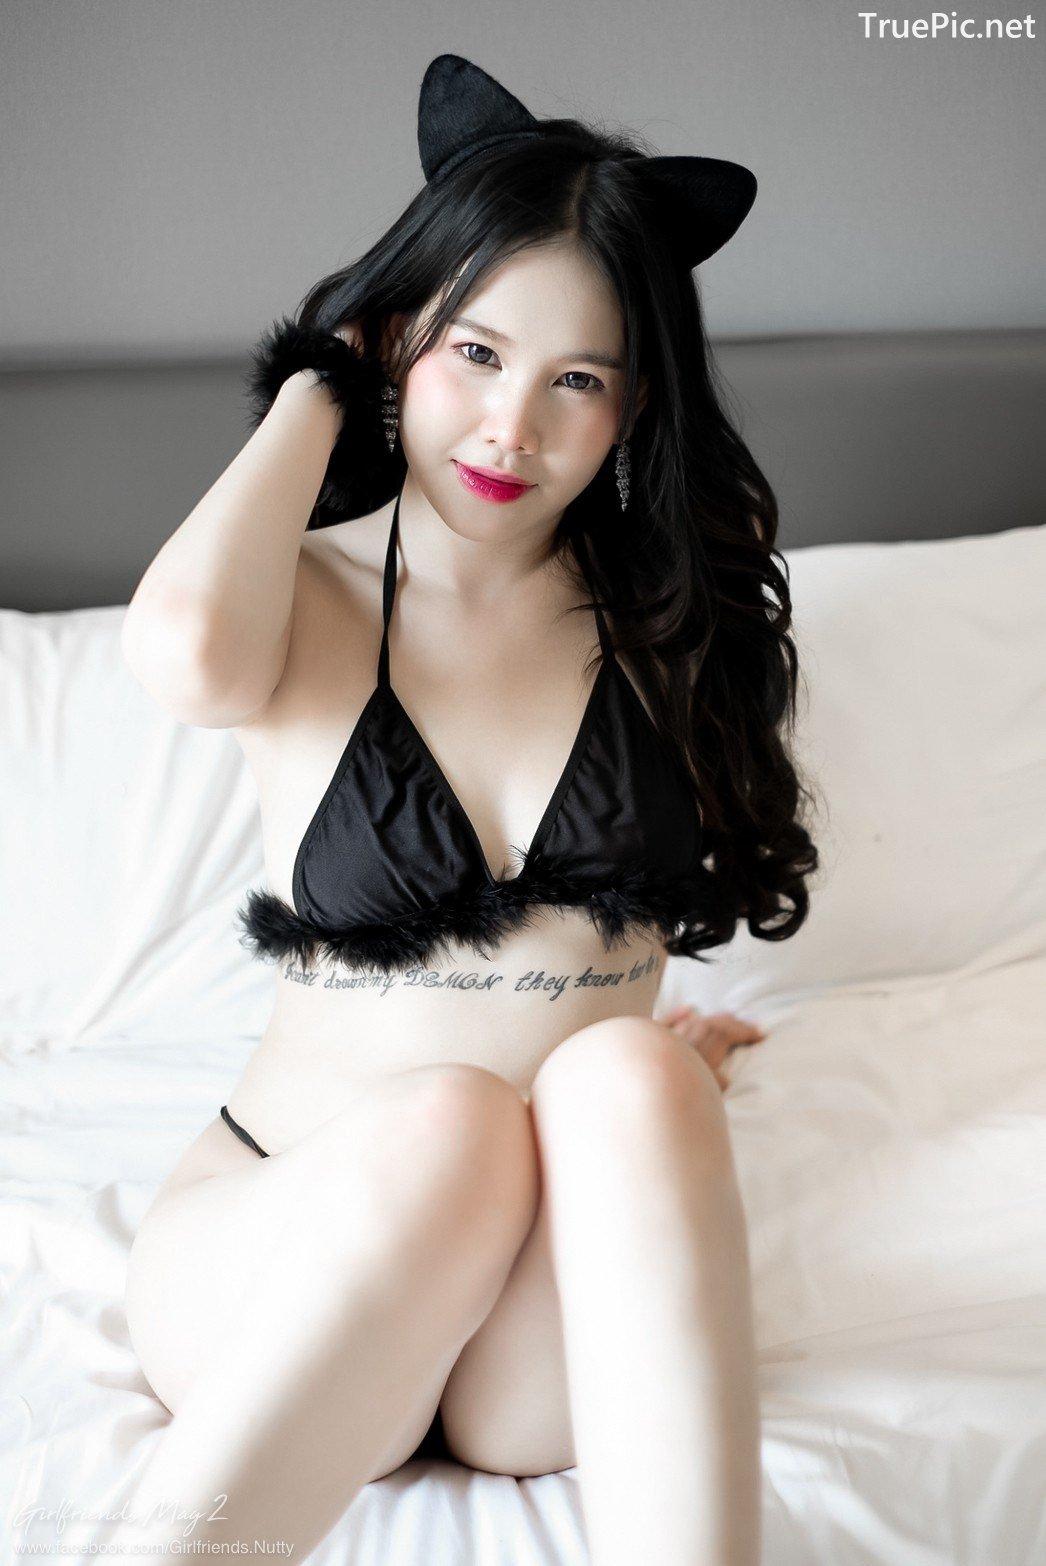 Image Thailand Model - Chanunshida Phuangsombut - Sexy Black Cat - TruePic.net - Picture-5